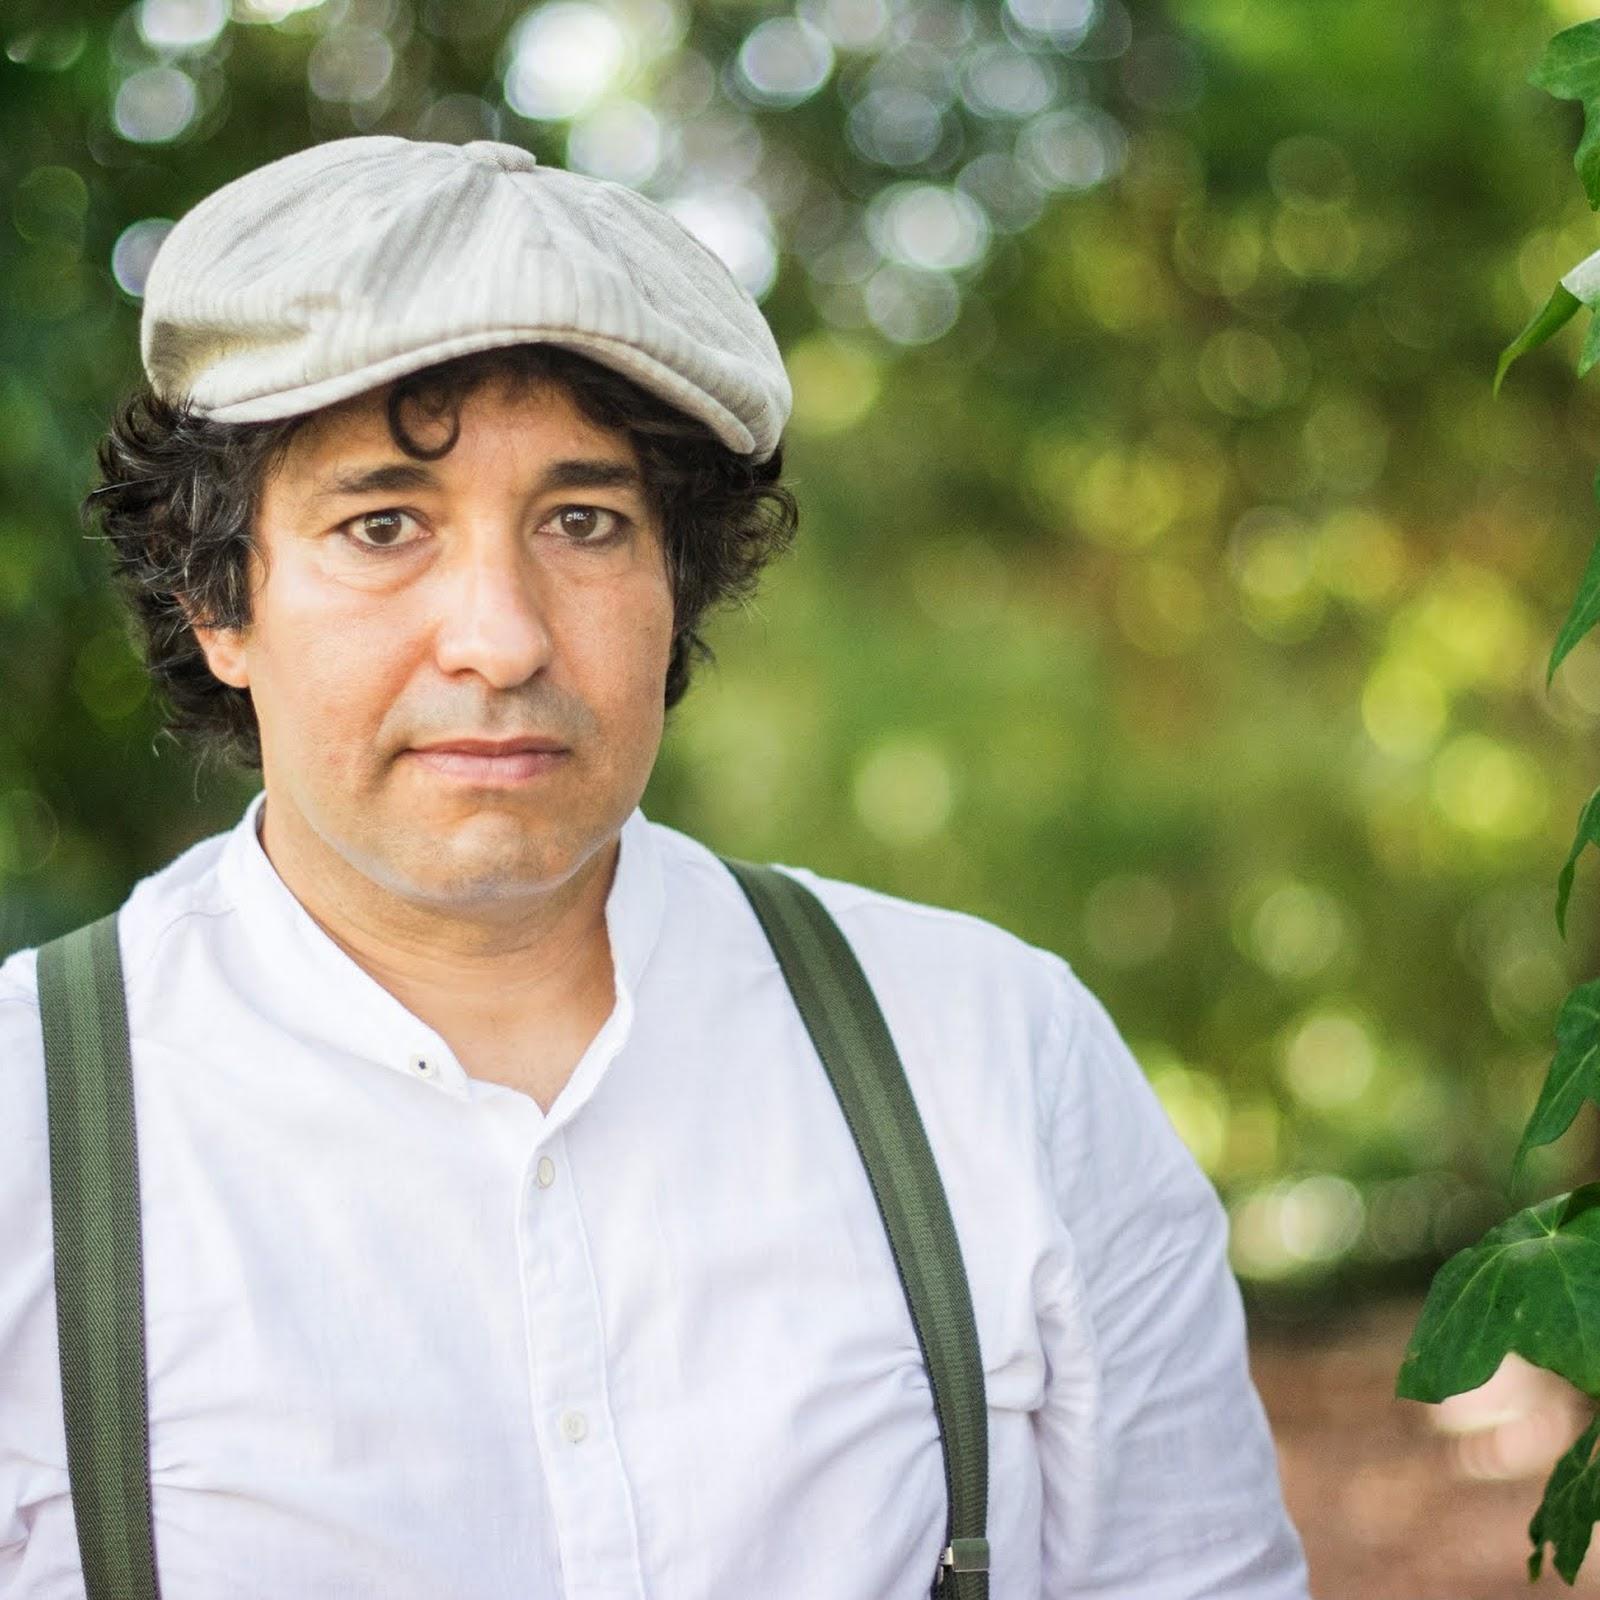 Fidel Galbán